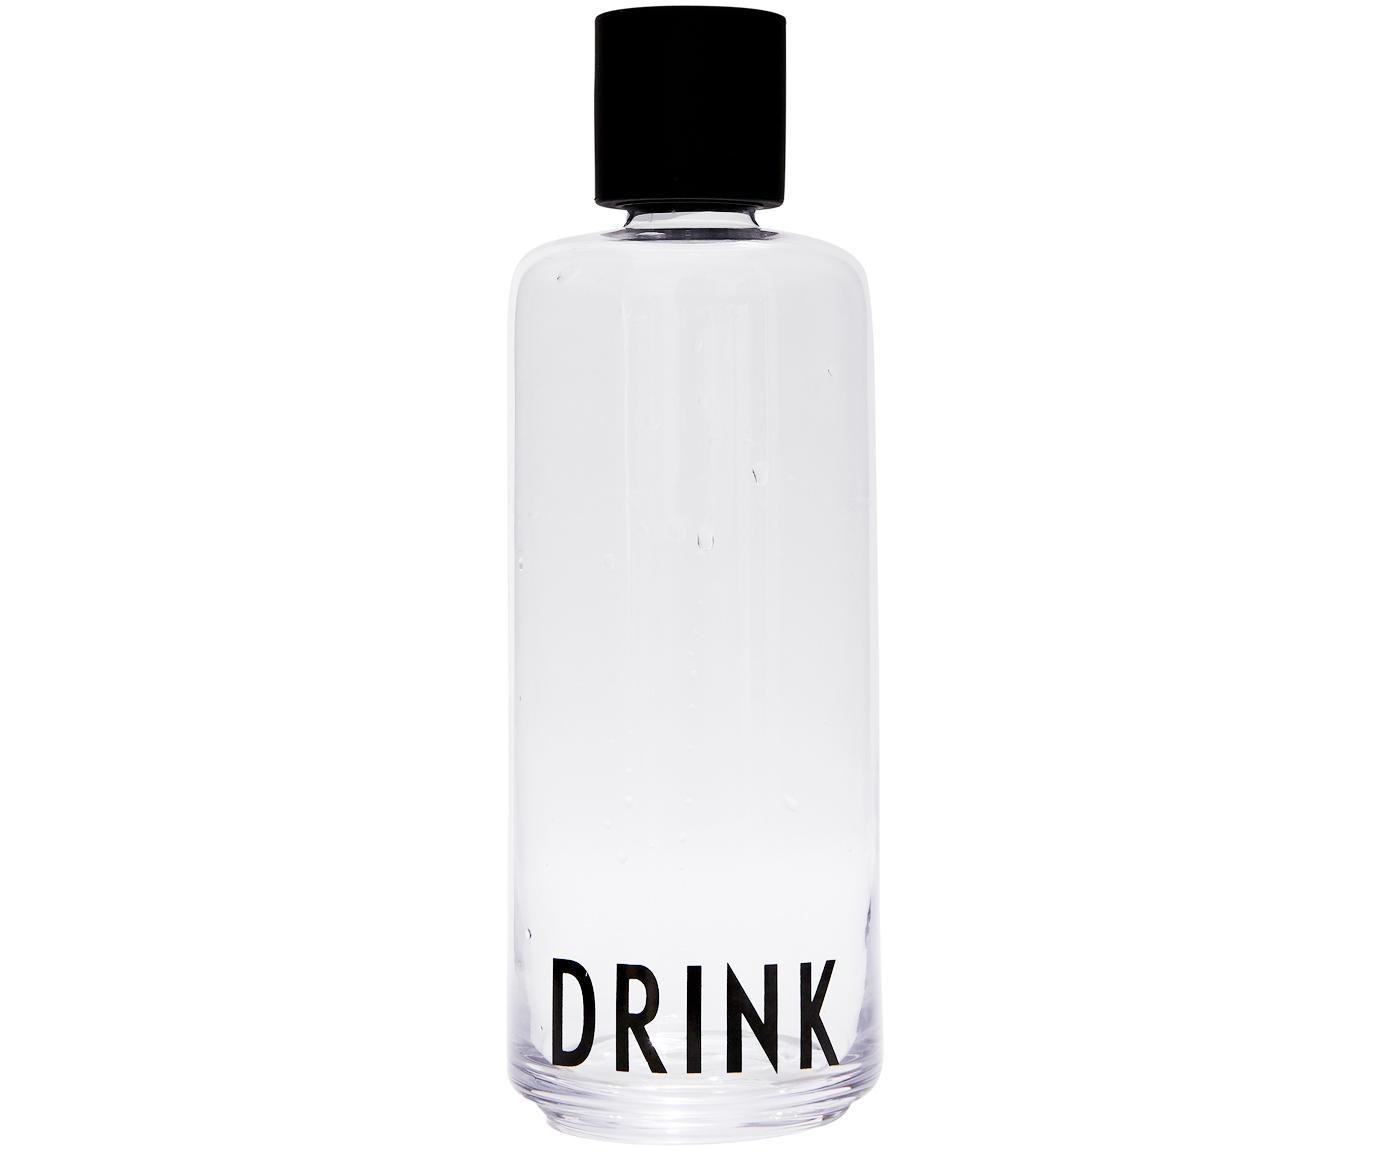 Karafka Daily Drink, Transparentny, 1 l